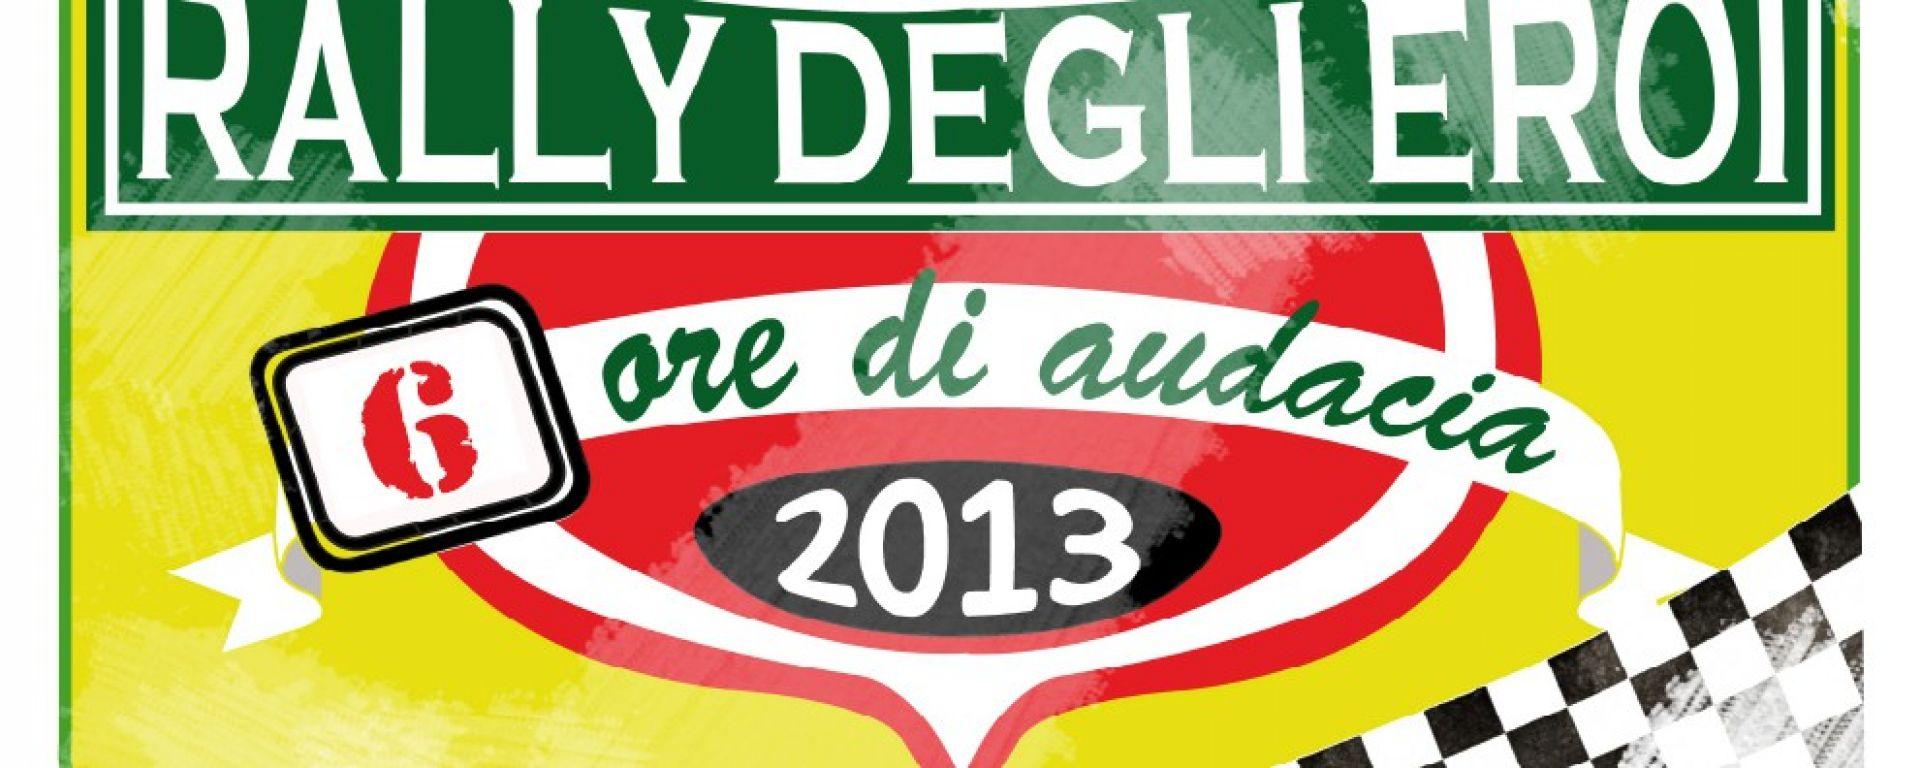 Rally degli eroi 2013: la rivincita